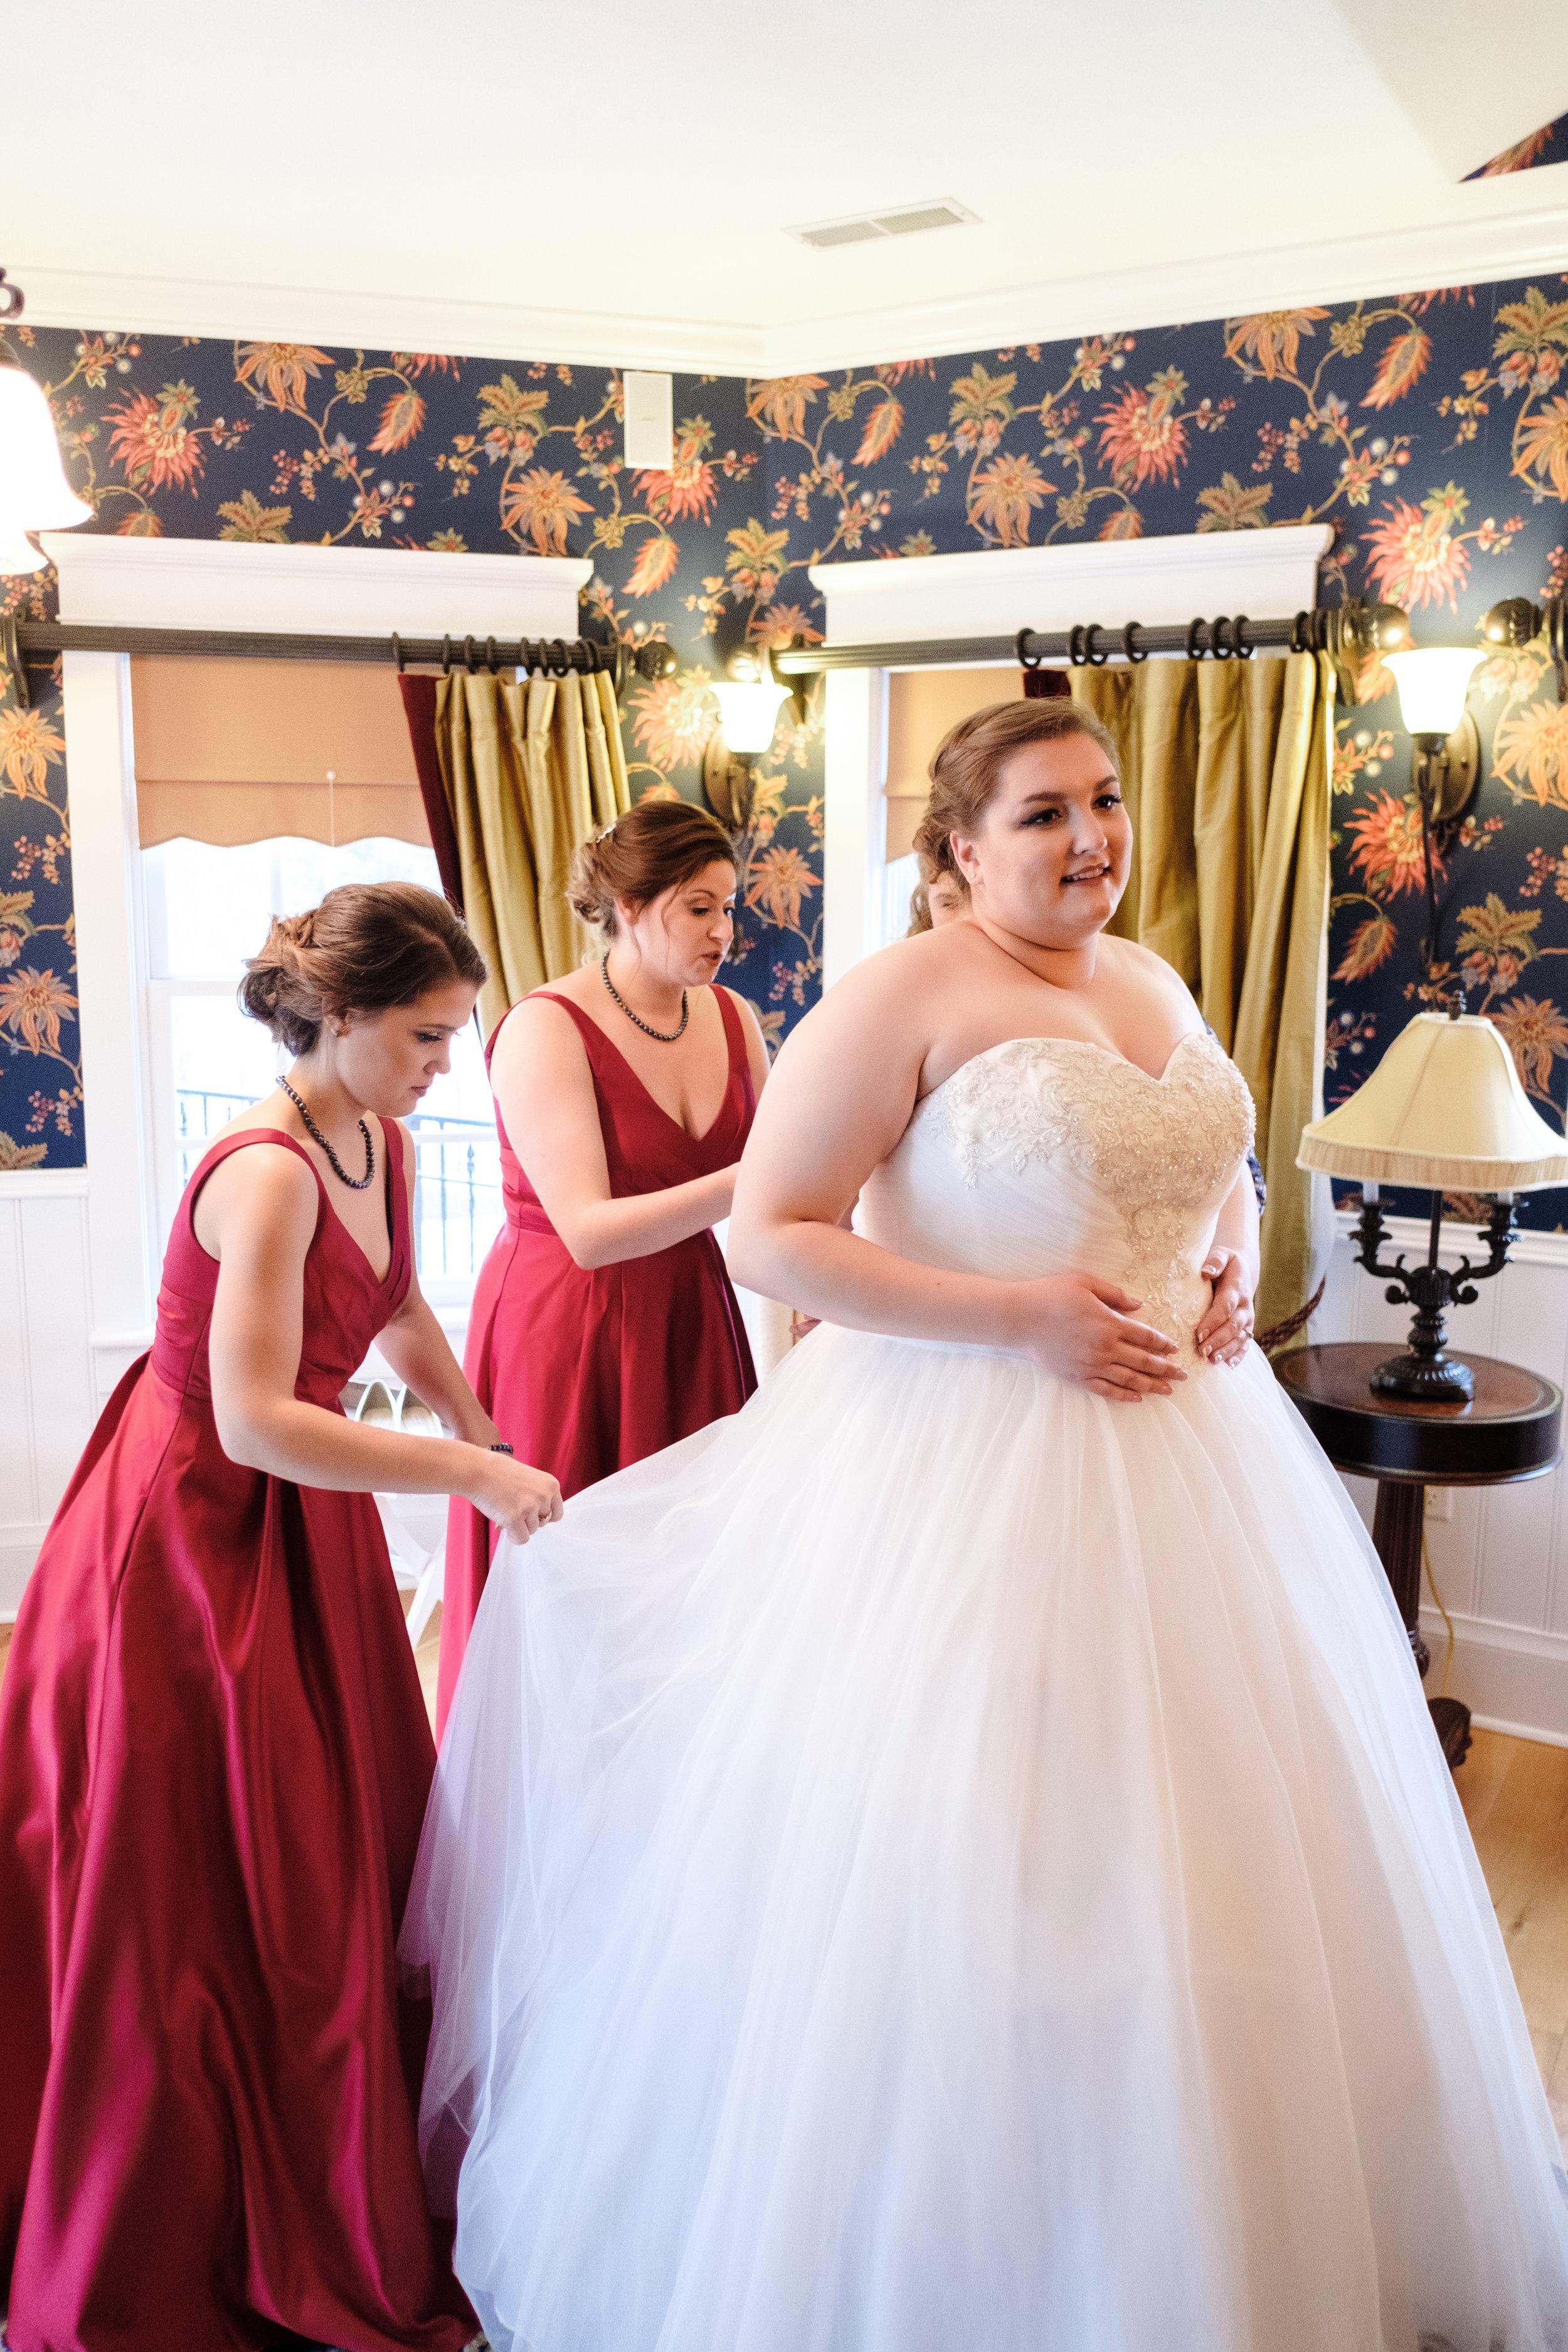 18-12-28 Corinne-Henry-Pavilion-Wedding-42.jpg